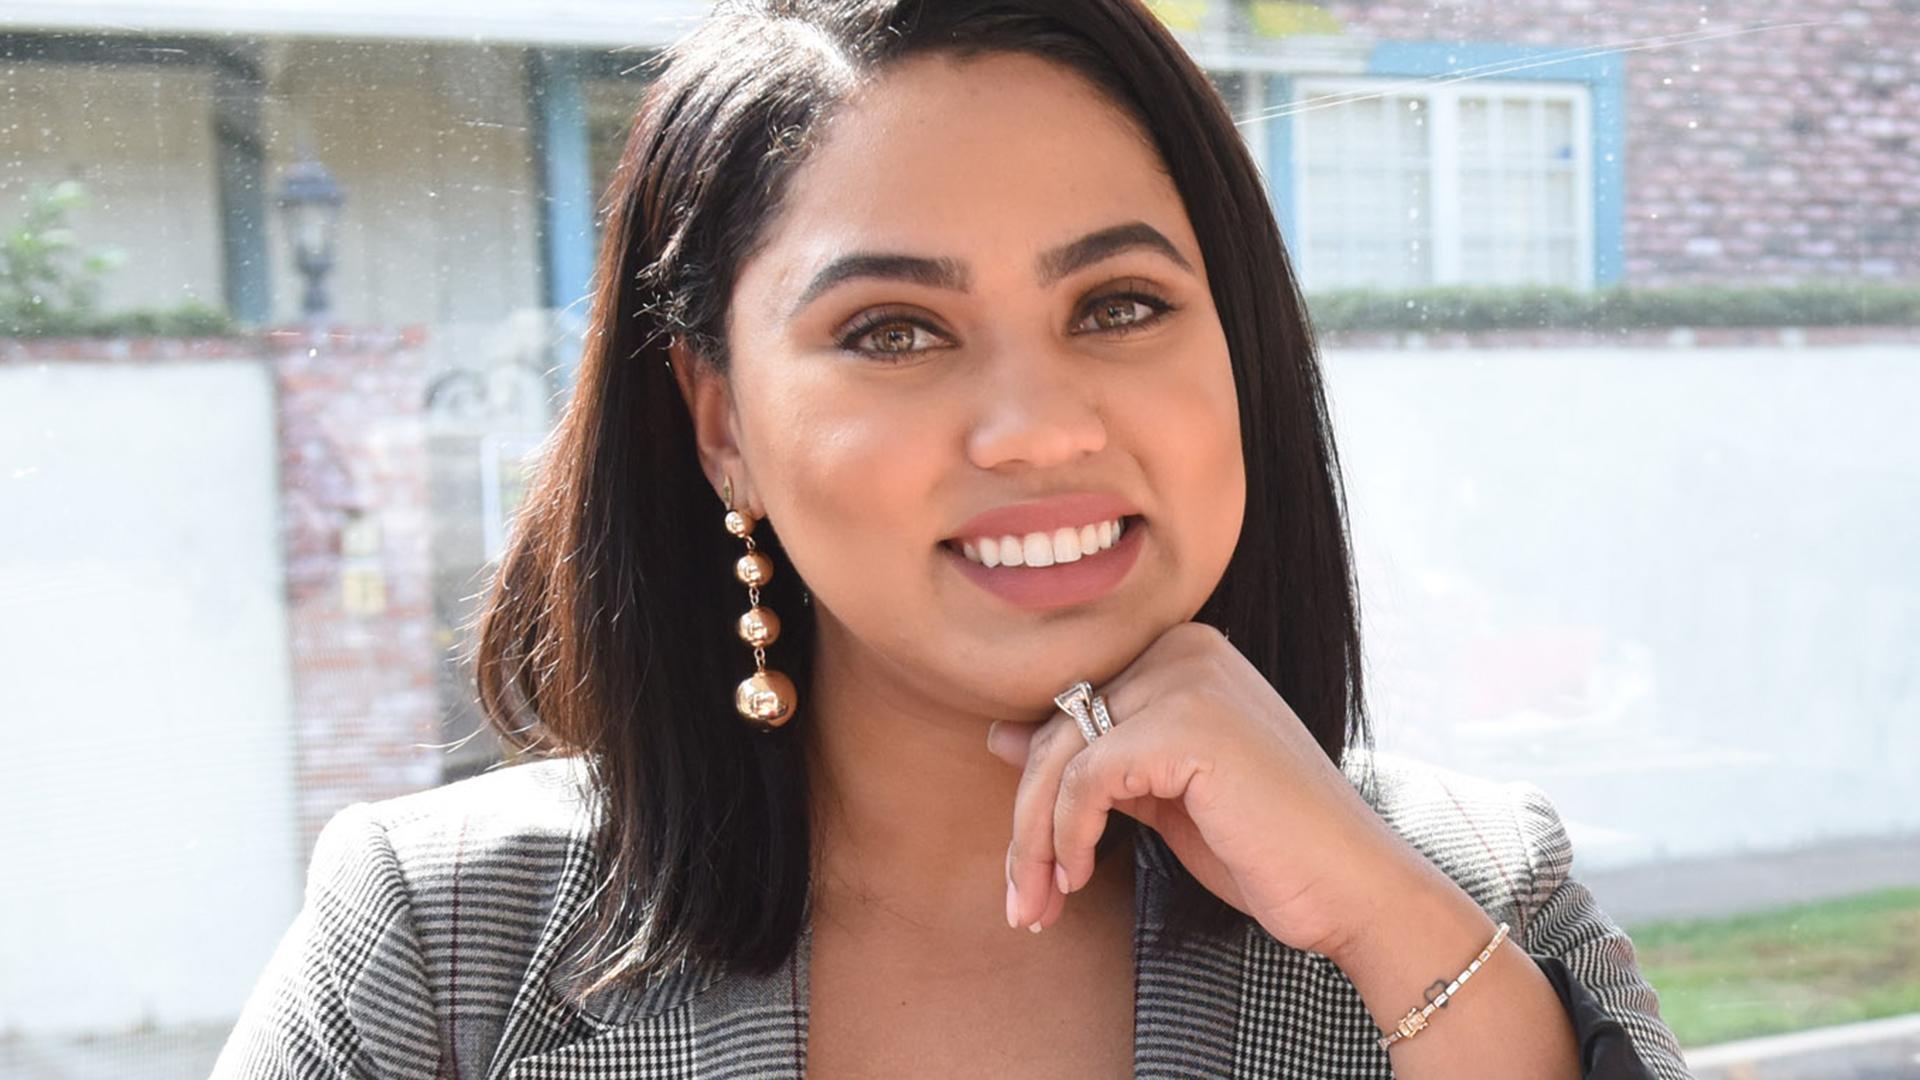 ayesha curry has hyperemesis gravidarum like former kate